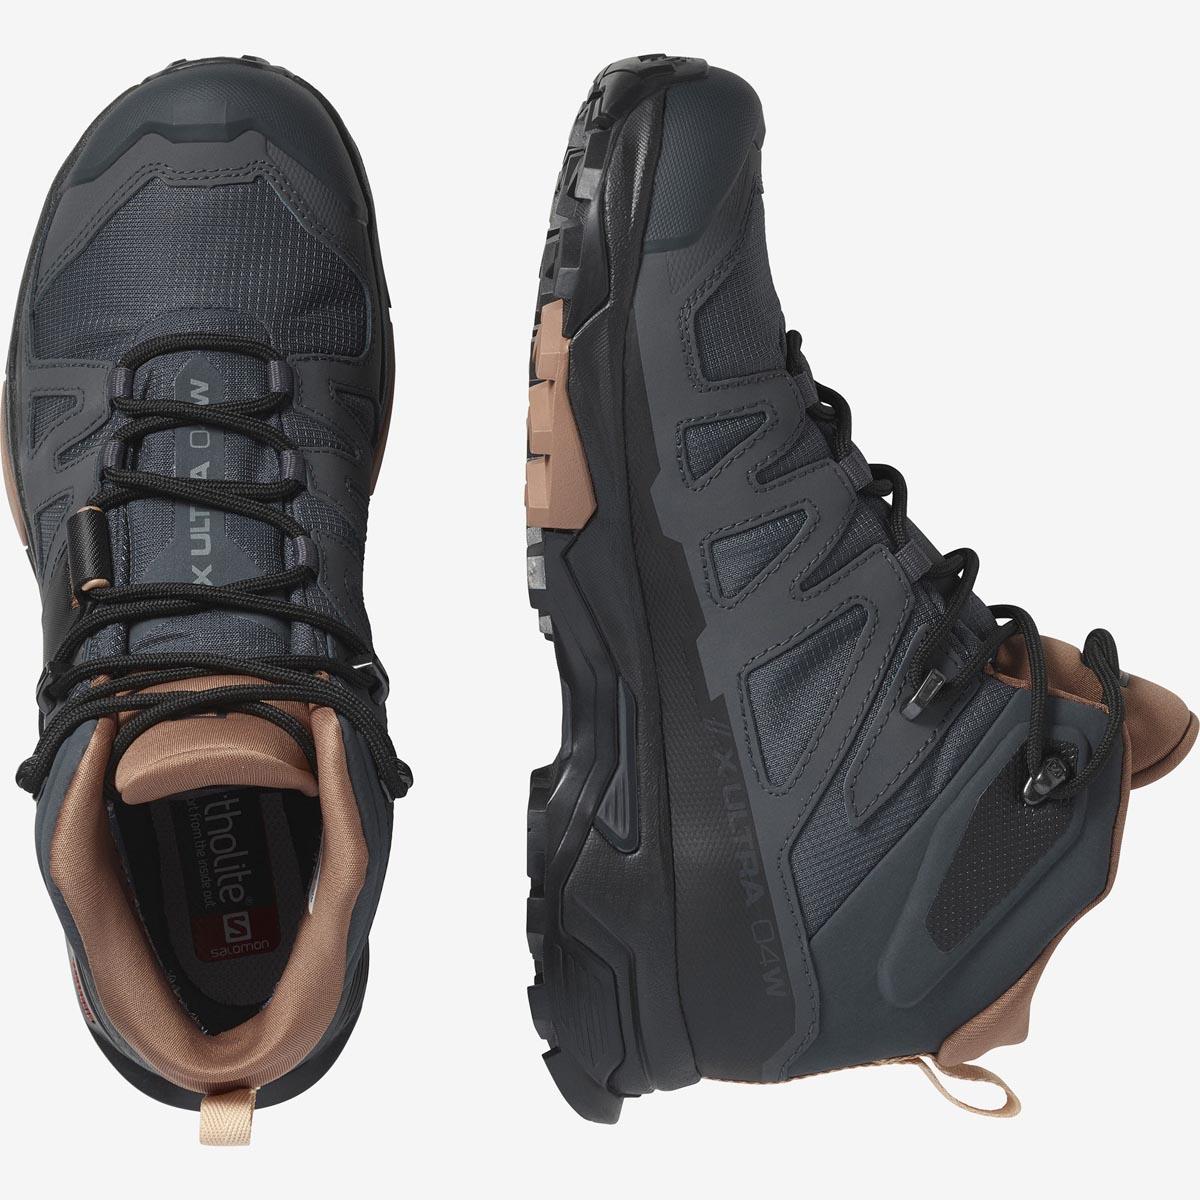 Ботинки X ULTRA 4 MID GTX W